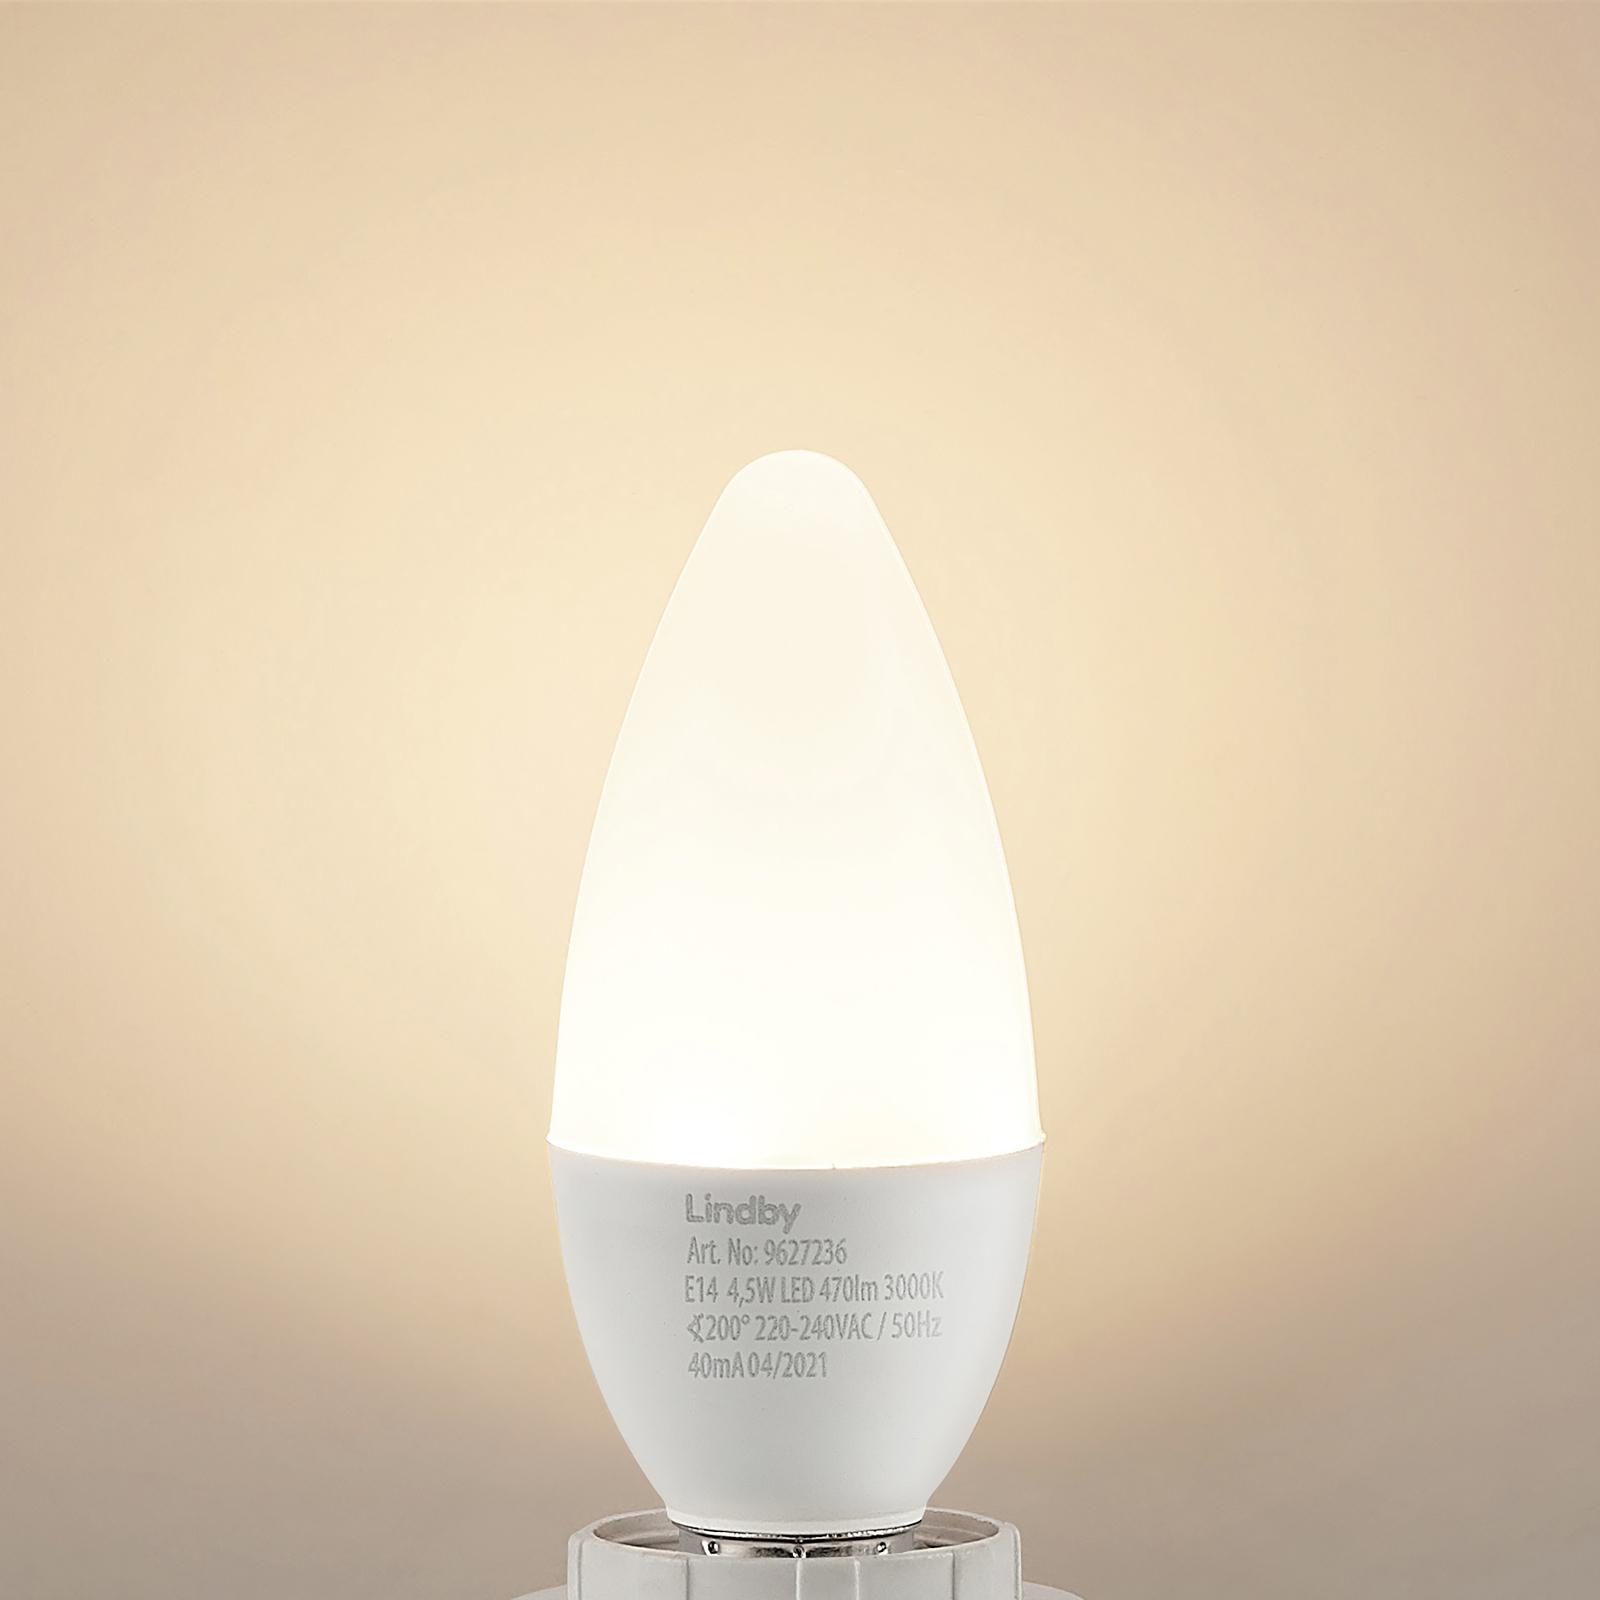 Lindby LED-kronljuslampa E14 C35 4,5W 3000 K opal